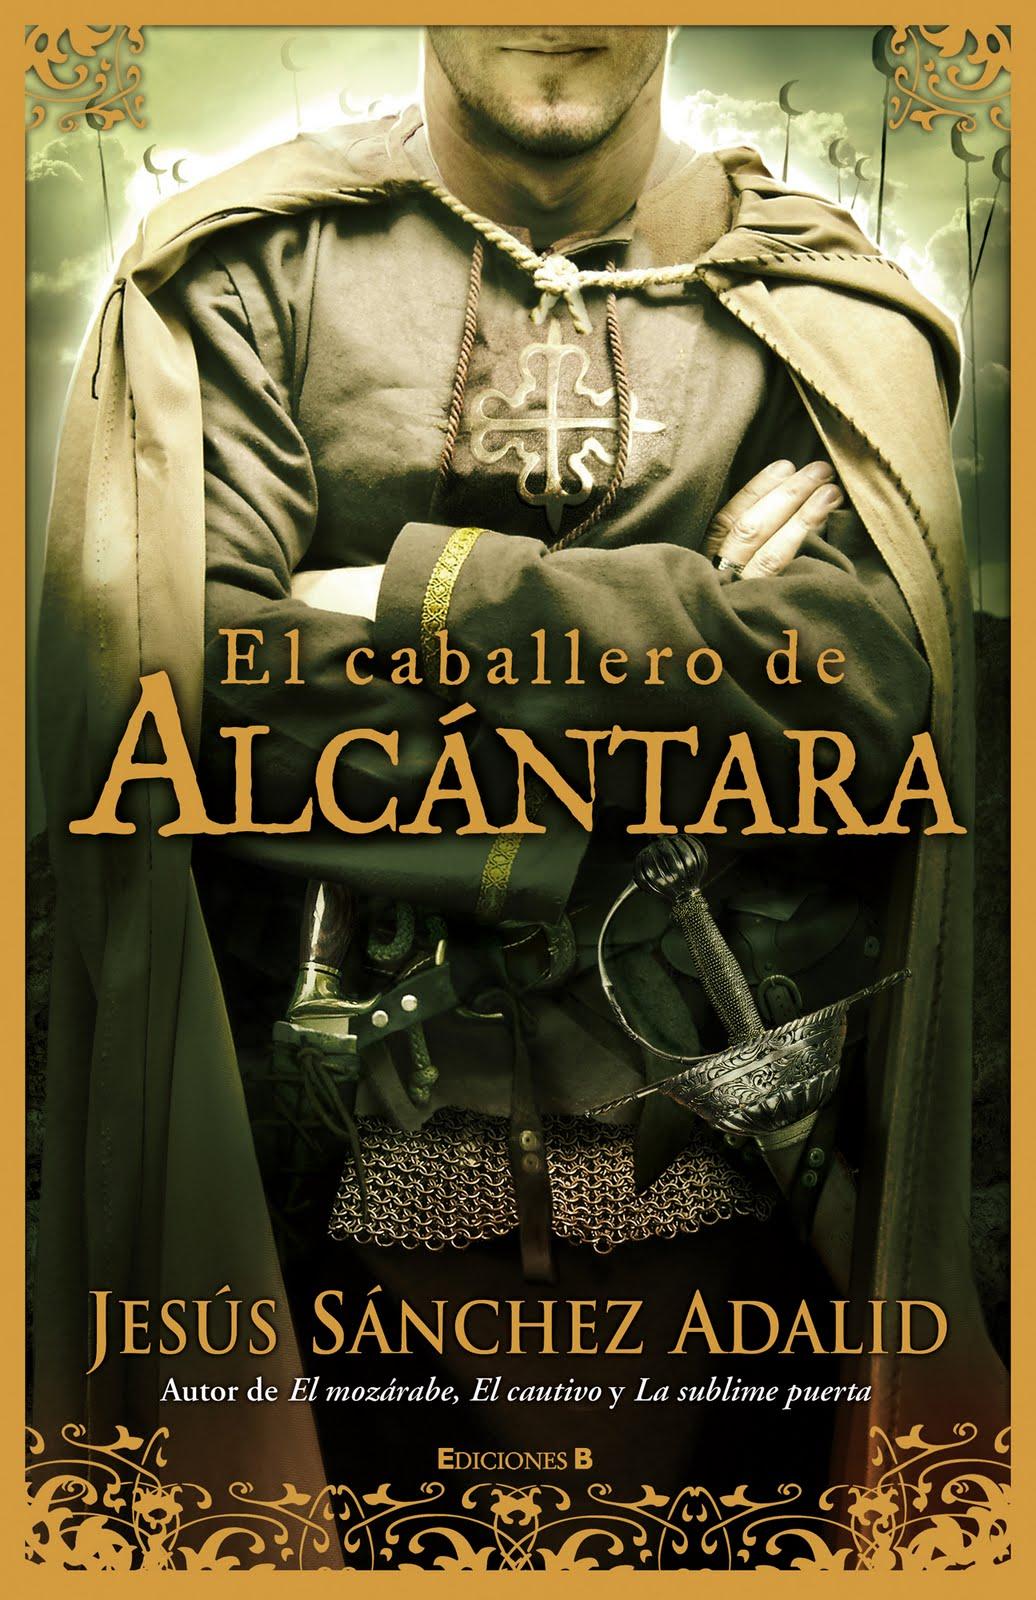 https://i1.wp.com/2.bp.blogspot.com/_CoBOcC_pla4/TBT8jxXMKMI/AAAAAAAAAeM/o3AkAGeL5pM/s1600/El+caballero+de+Alcantara.jpg?resize=242%2C324